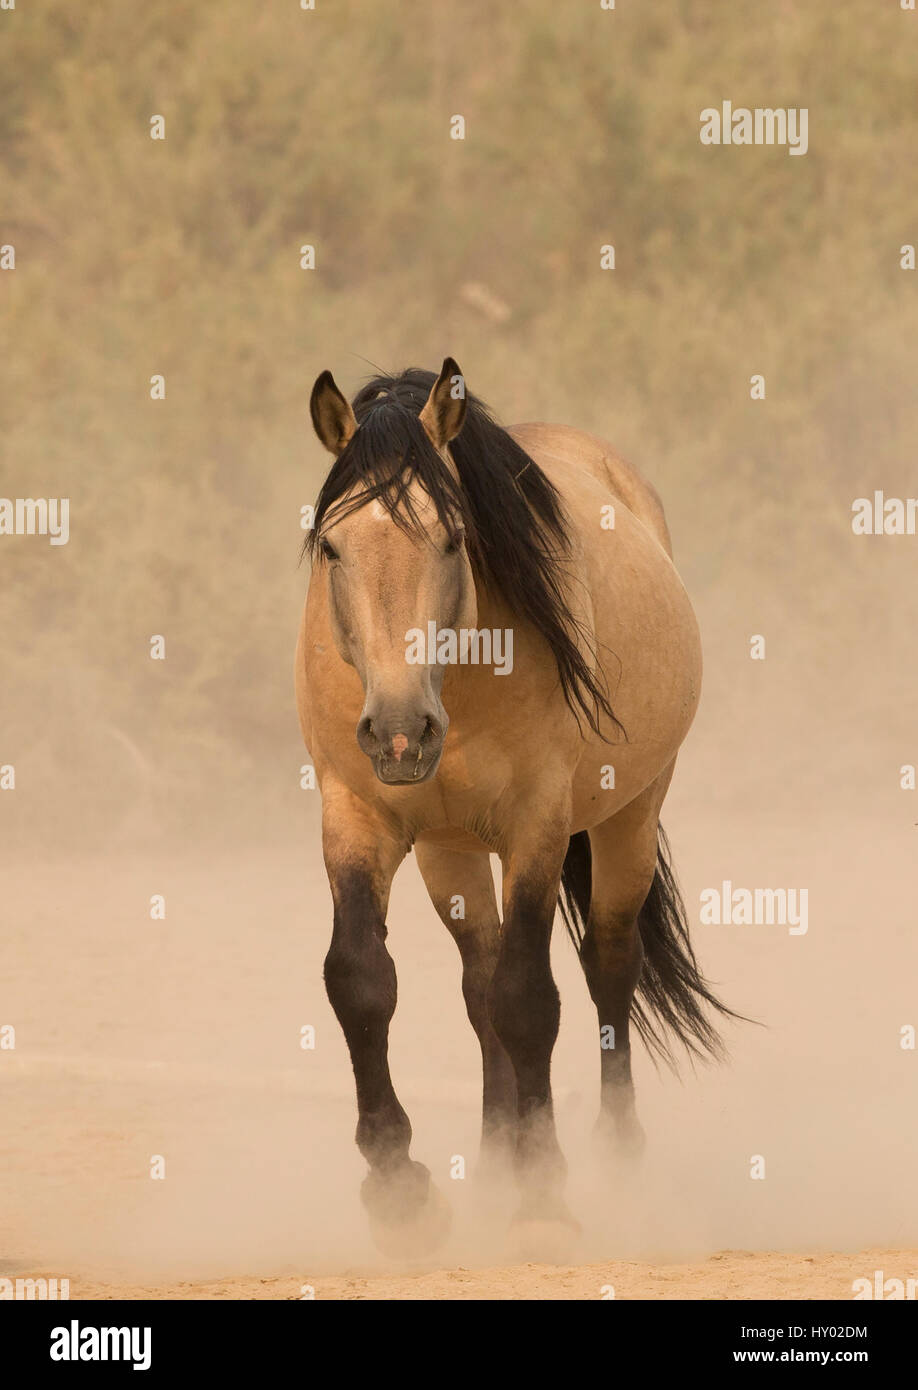 Wild buckskin Mustang stallion walking towards waterhole on dusty dry summer day, Sand Wash Basin, Colorado, USA. - Stock Image